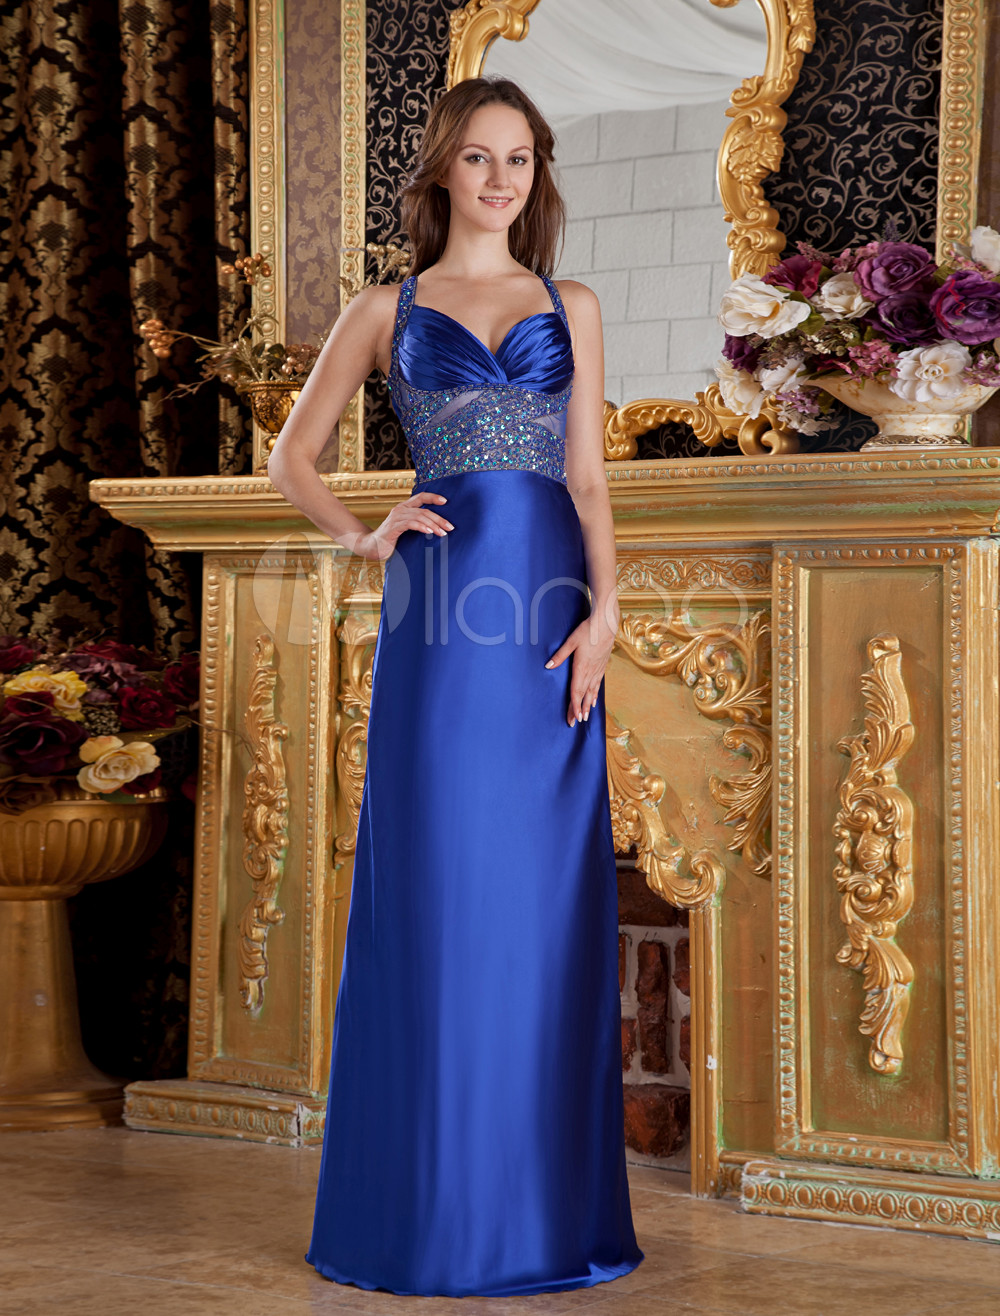 Royal Blue A-line Sequin Beading Satin Evening Dress (Wedding Evening Dresses) photo